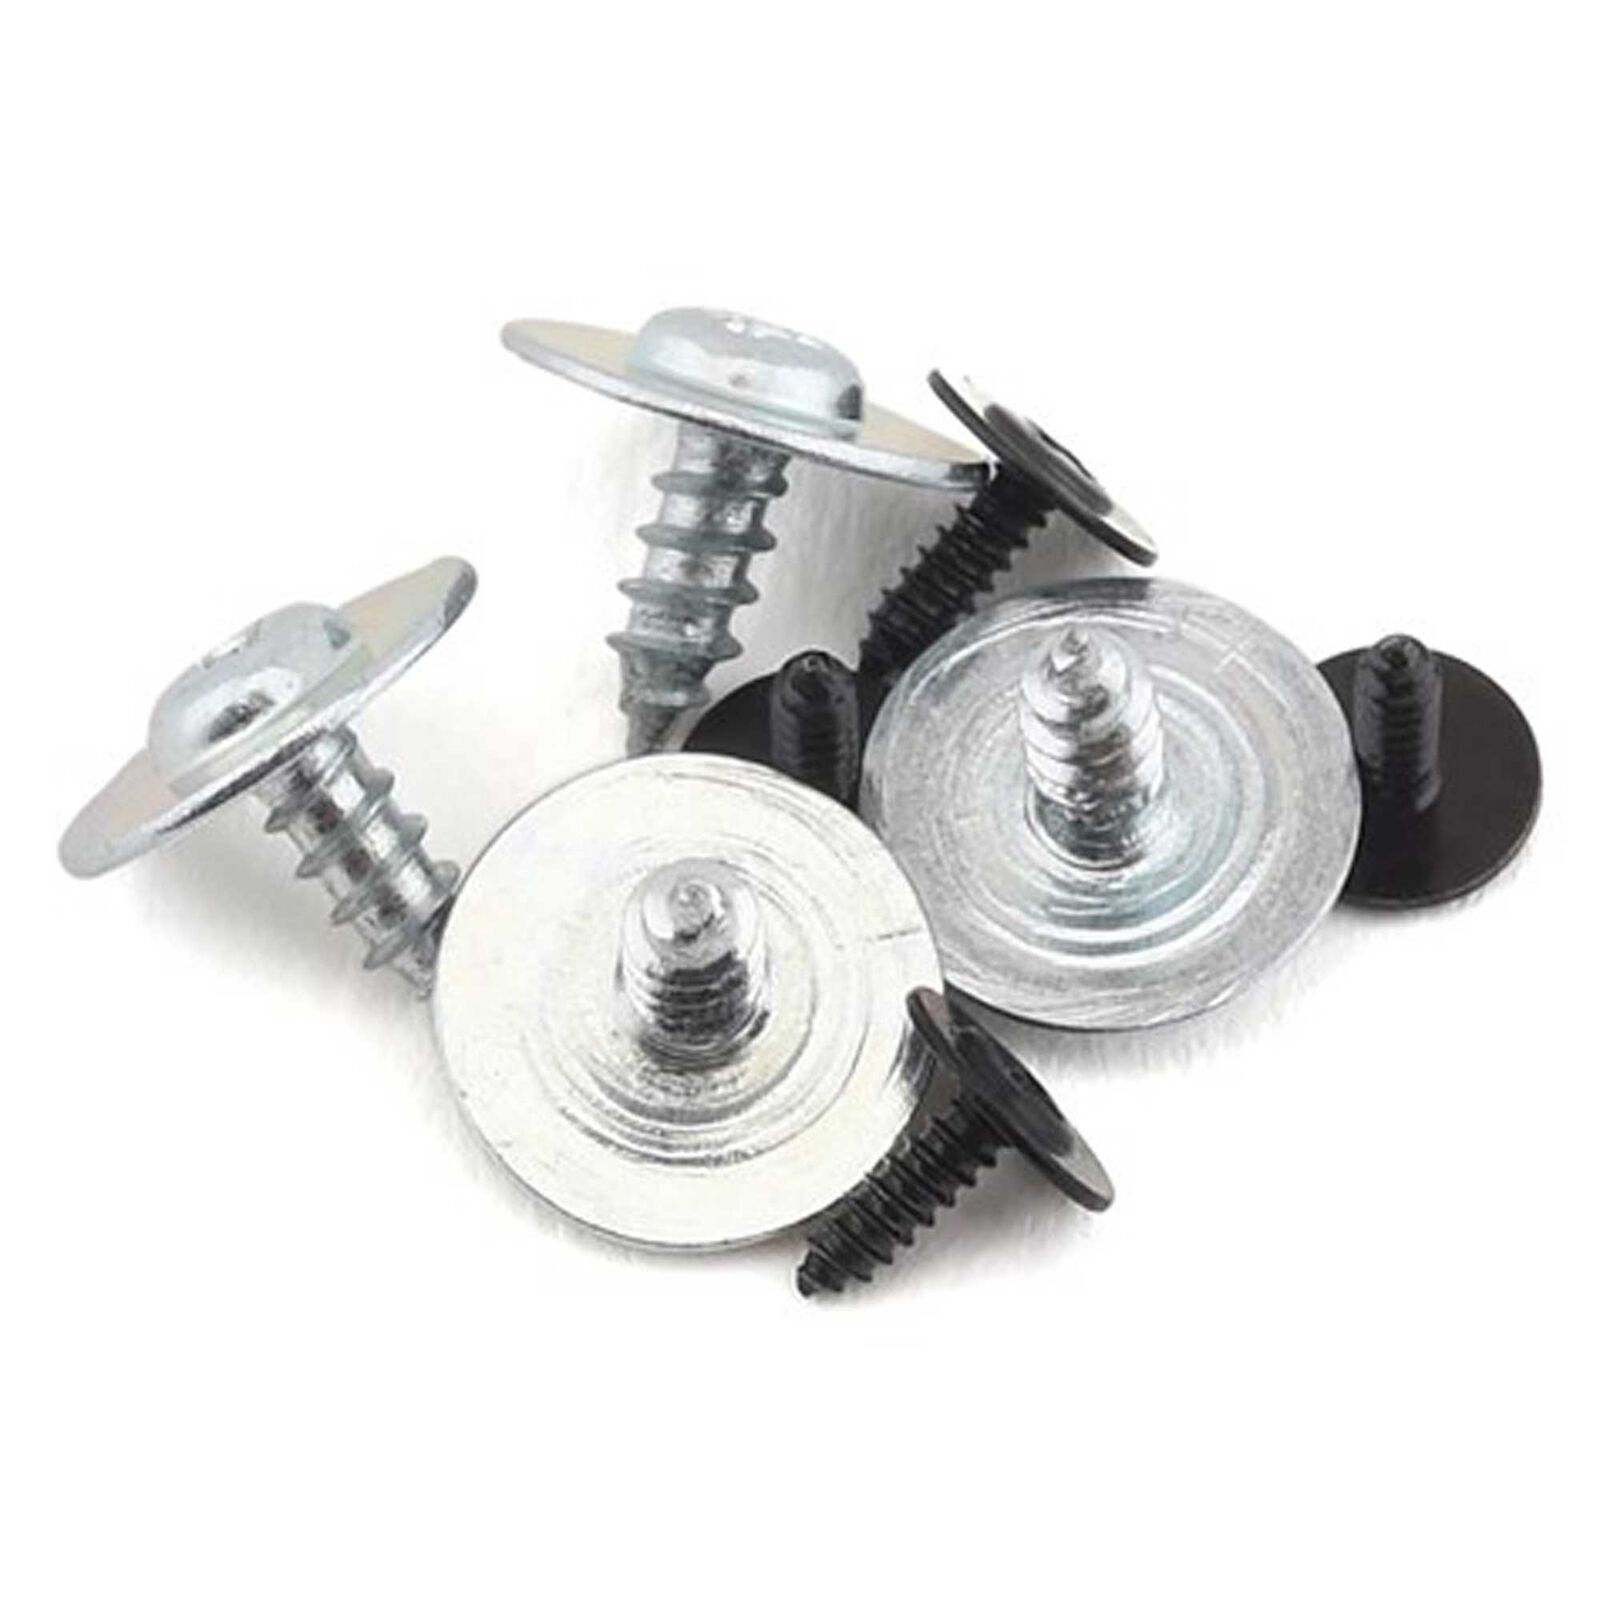 Screw set (8): Inductrix Switch